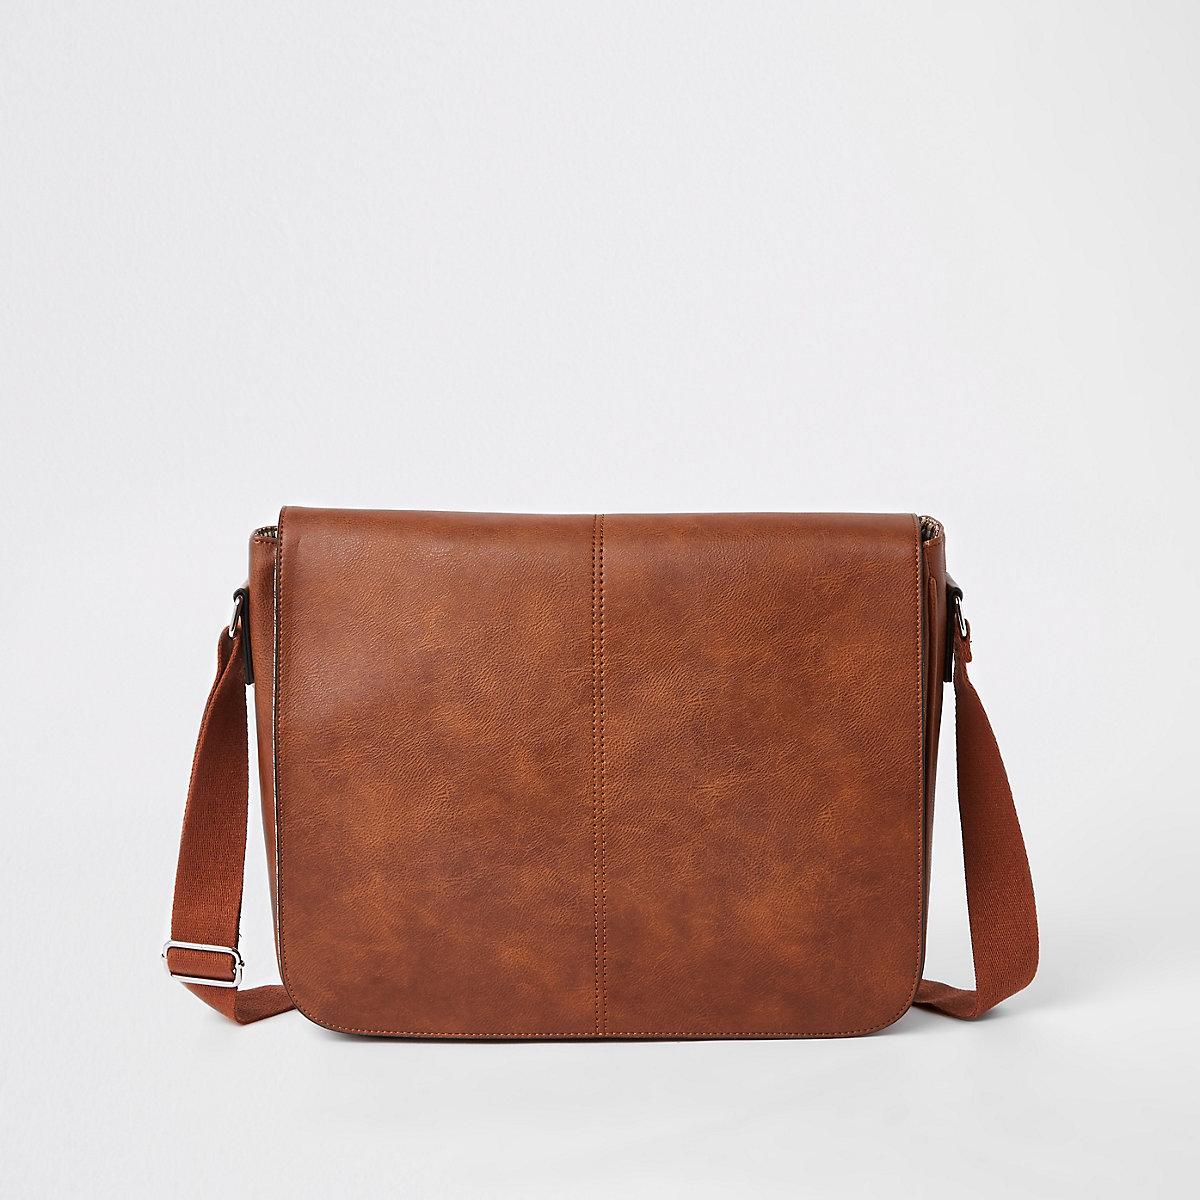 Brown faux leather flapover satchel bag